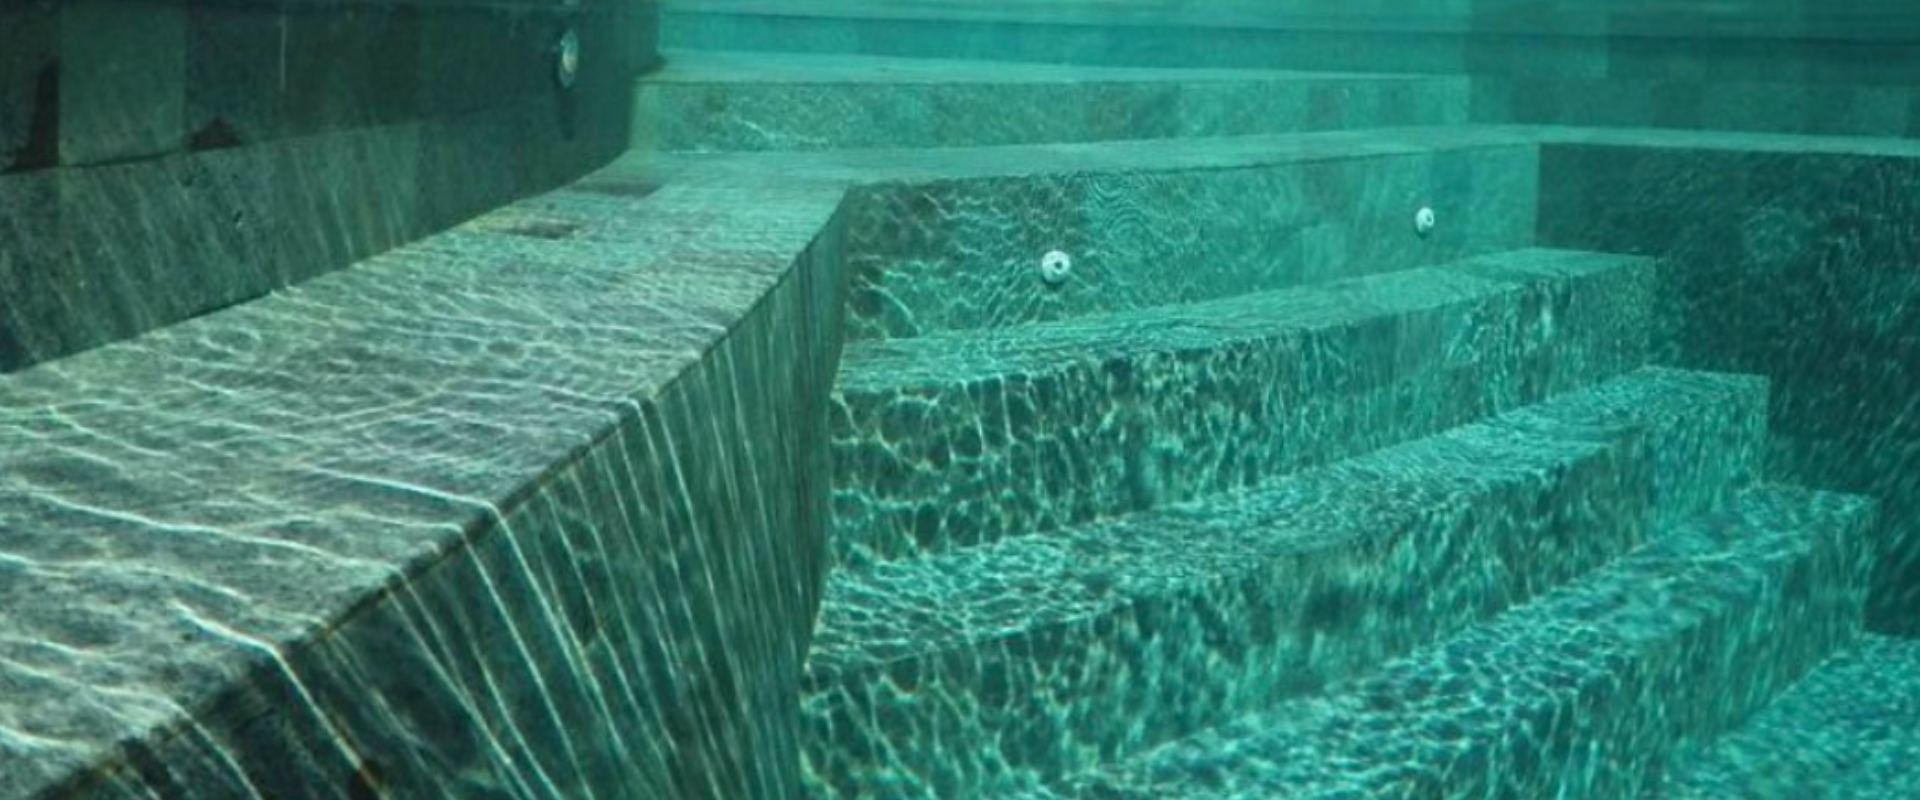 inside the blue pool